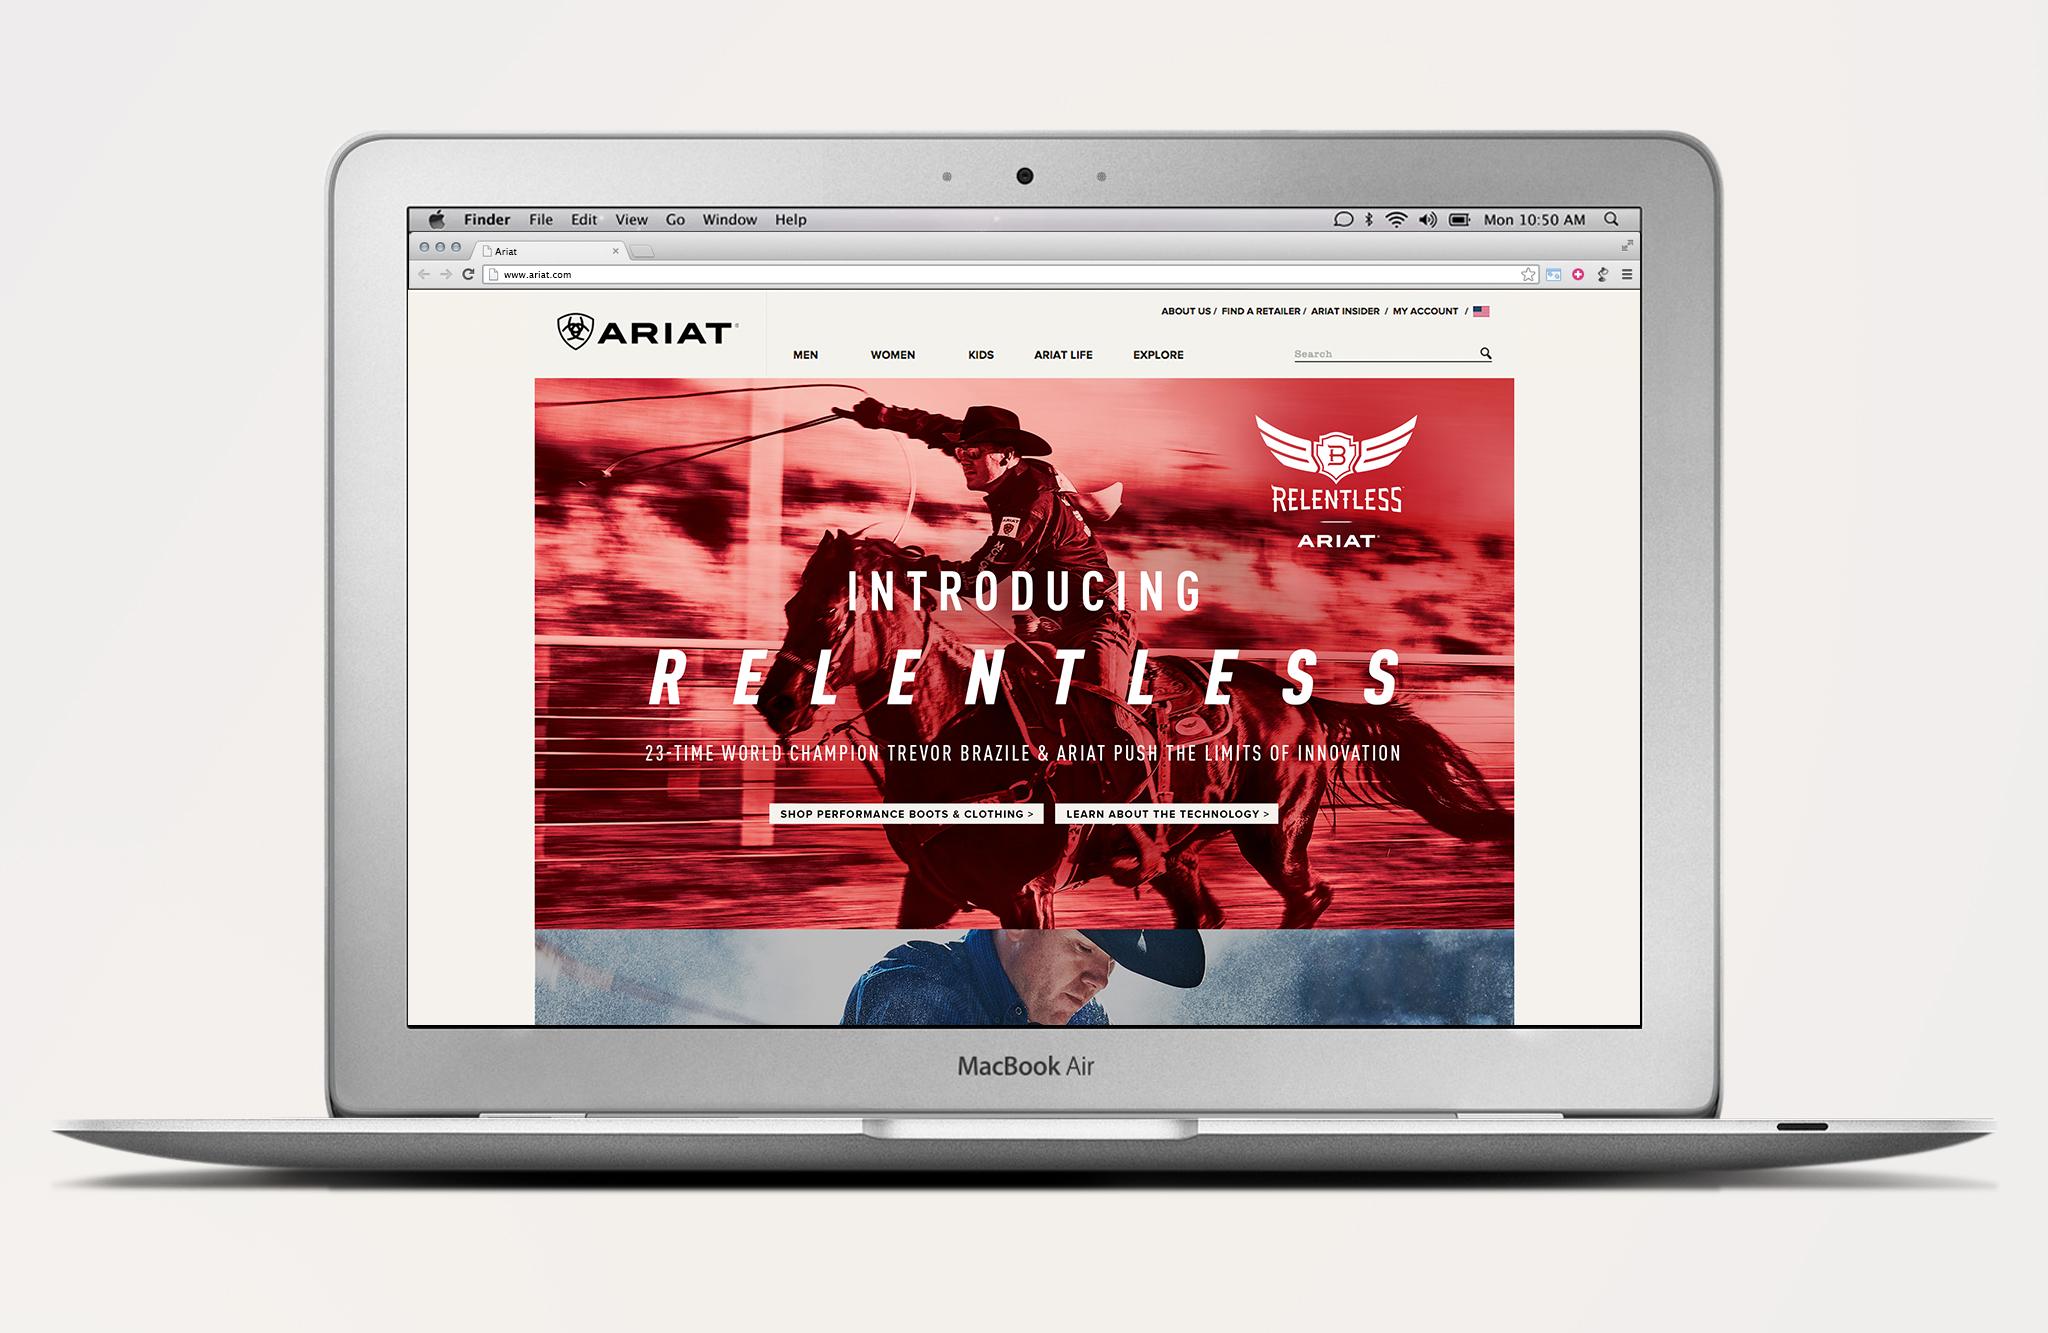 Ariat Relentless homepage displaced on laptop